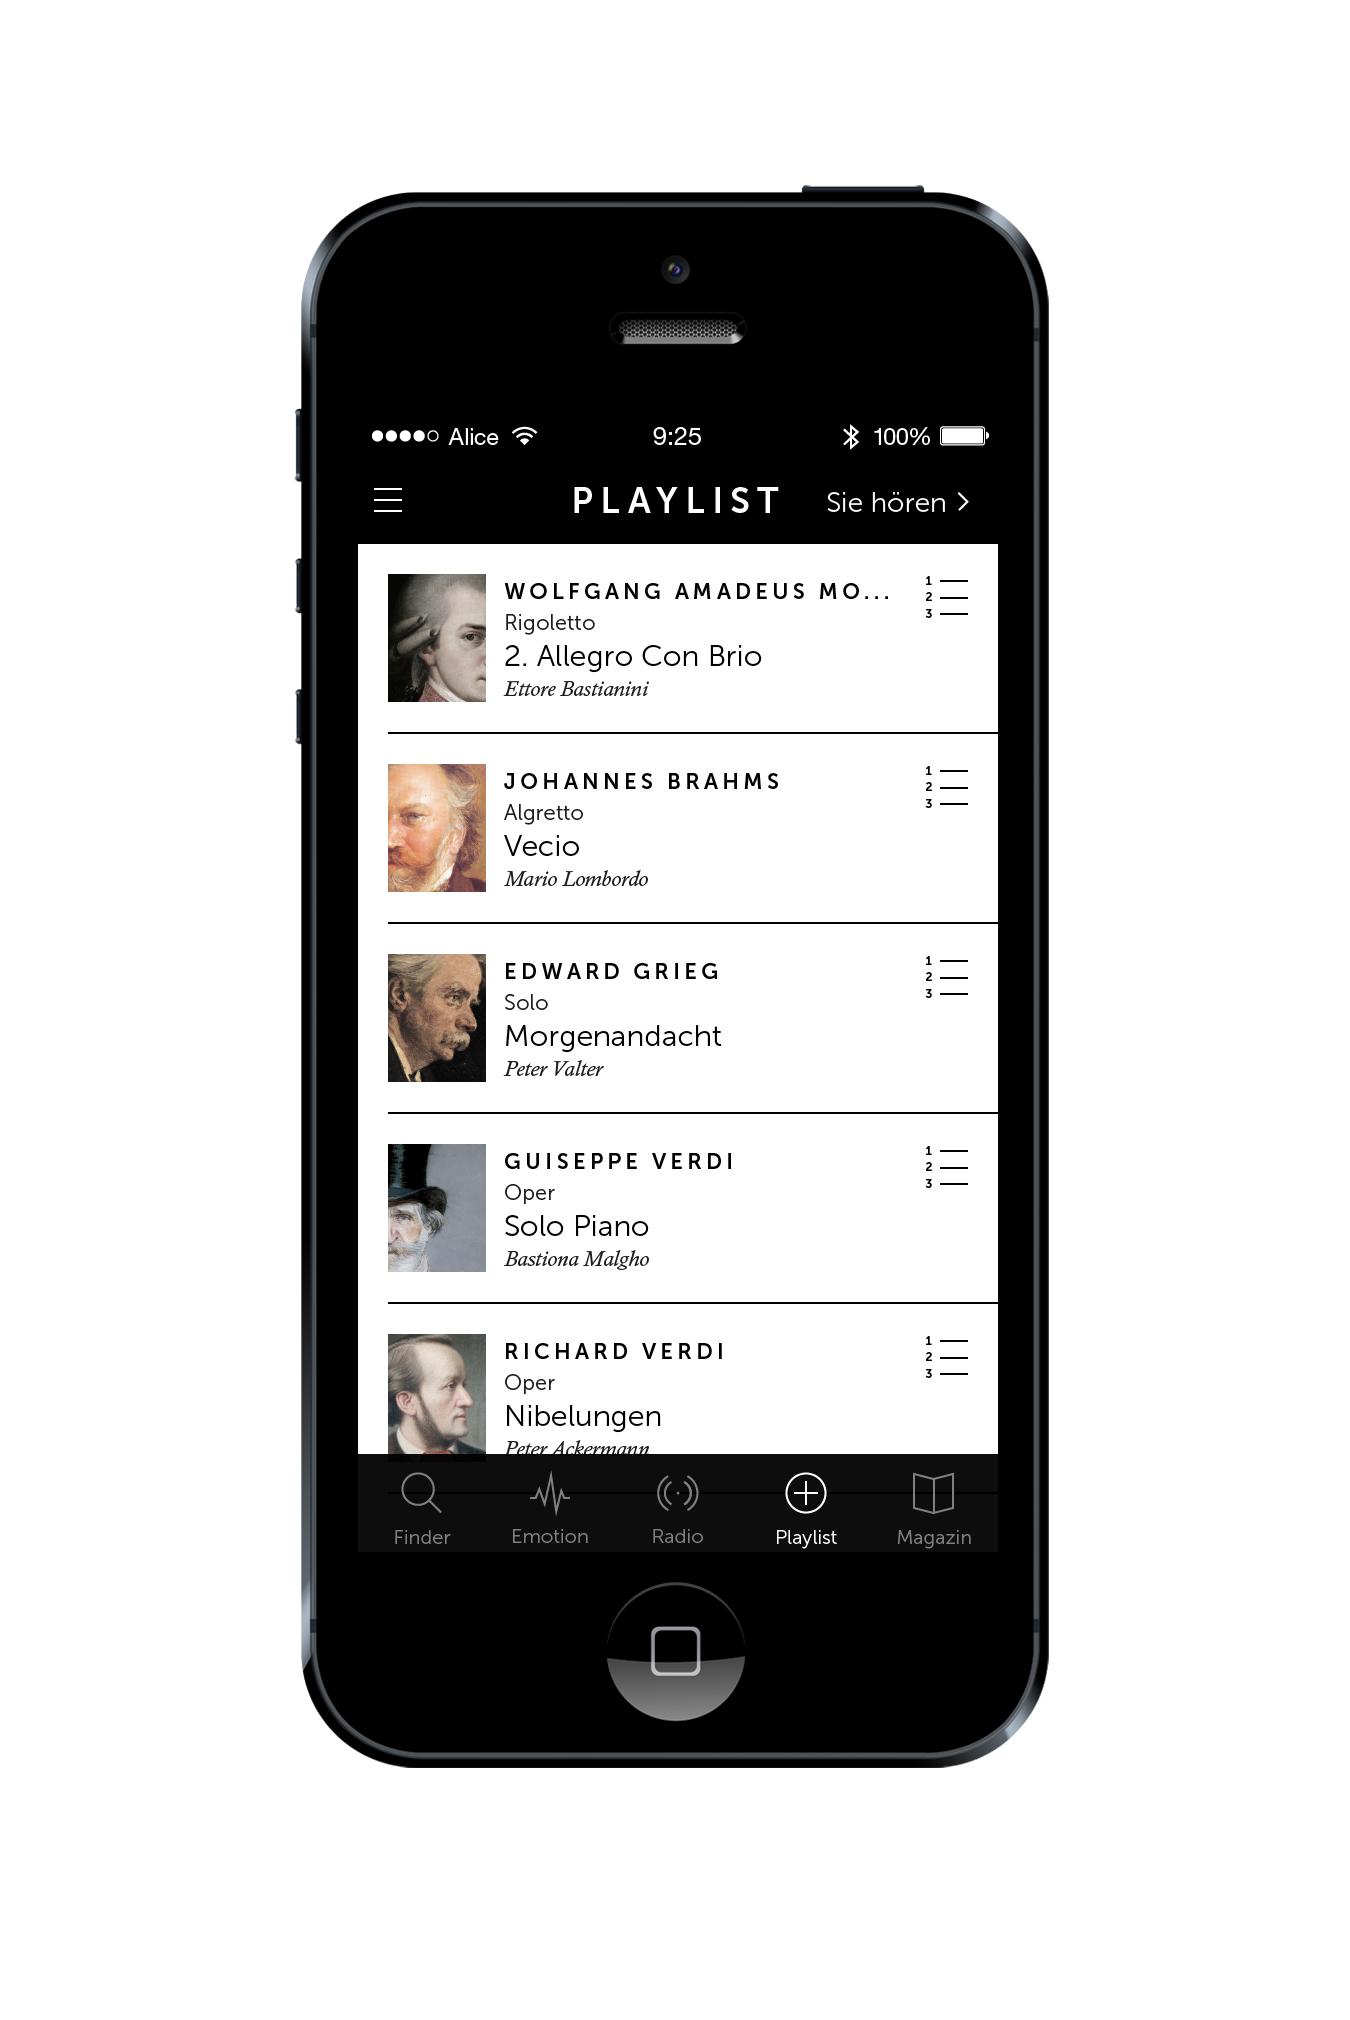 Idagio_AppDesign_Playlist_iphone5_140908-01